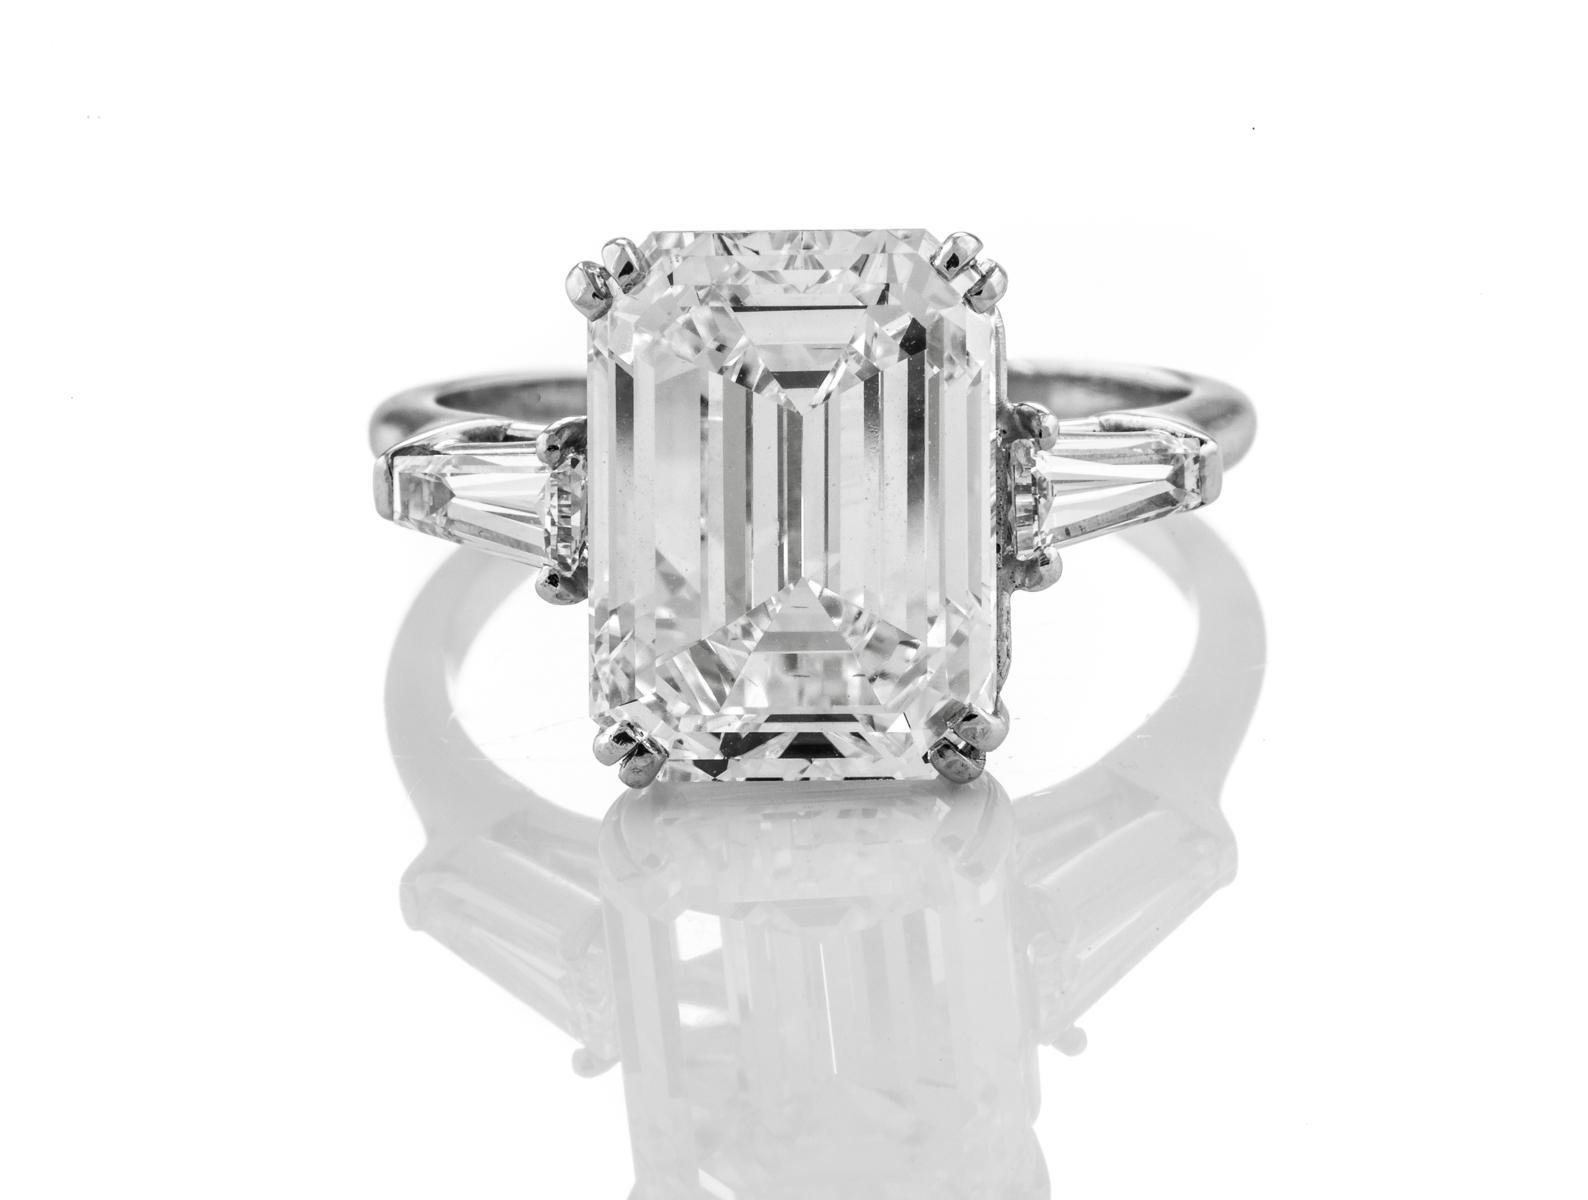 Emerald Diamond 4.61ct F VS1 Shape IGI Certified CVD TYPE2A